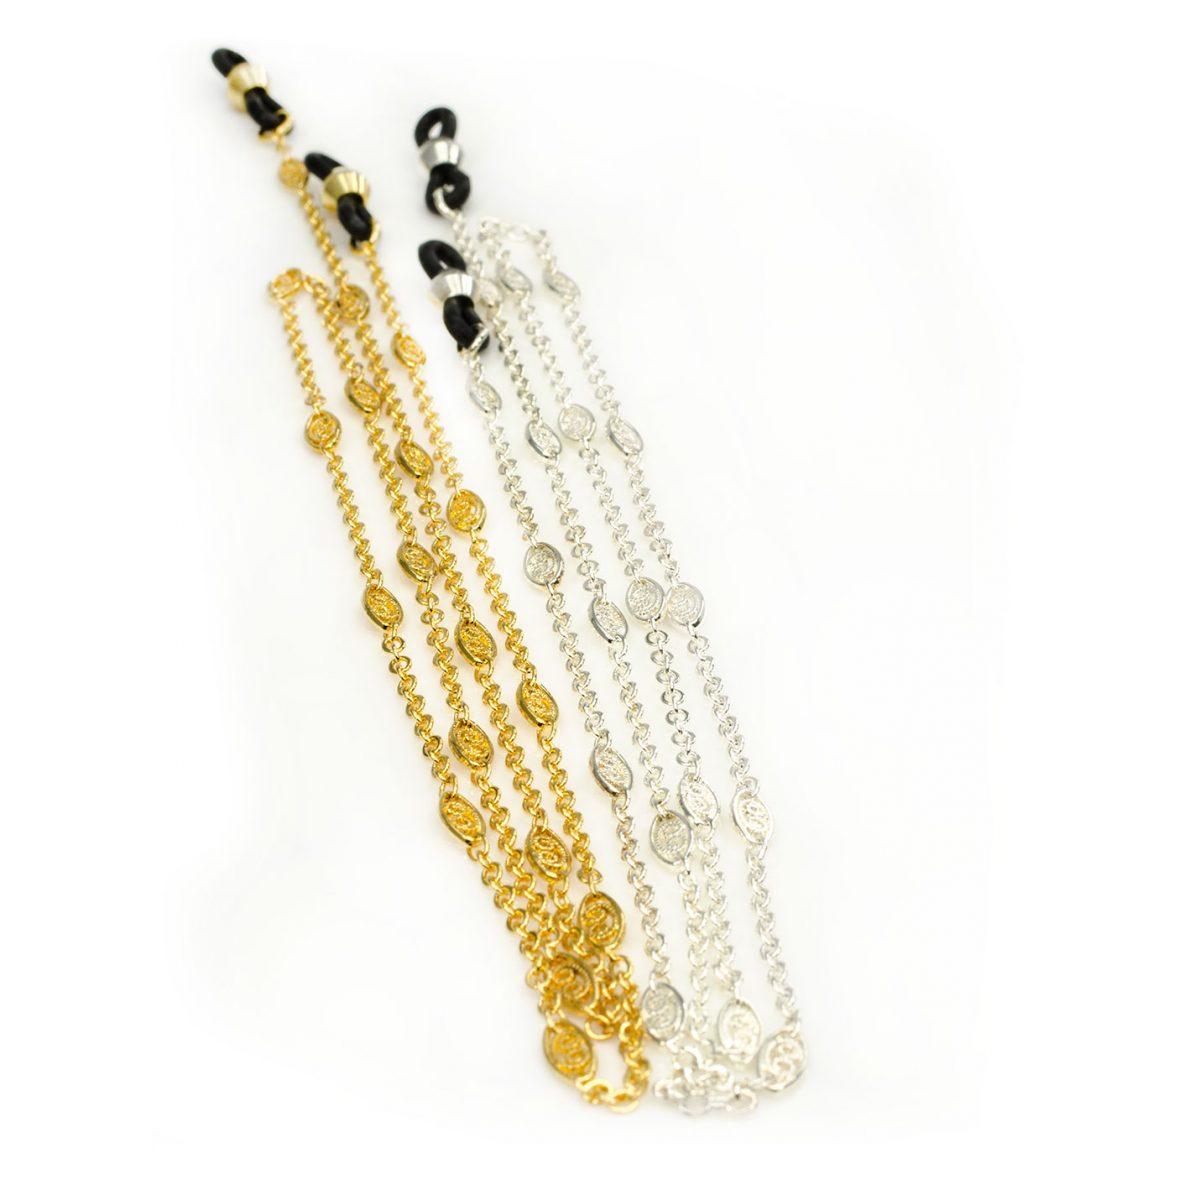 Elegant eyeglasses chains, Belcher Oval